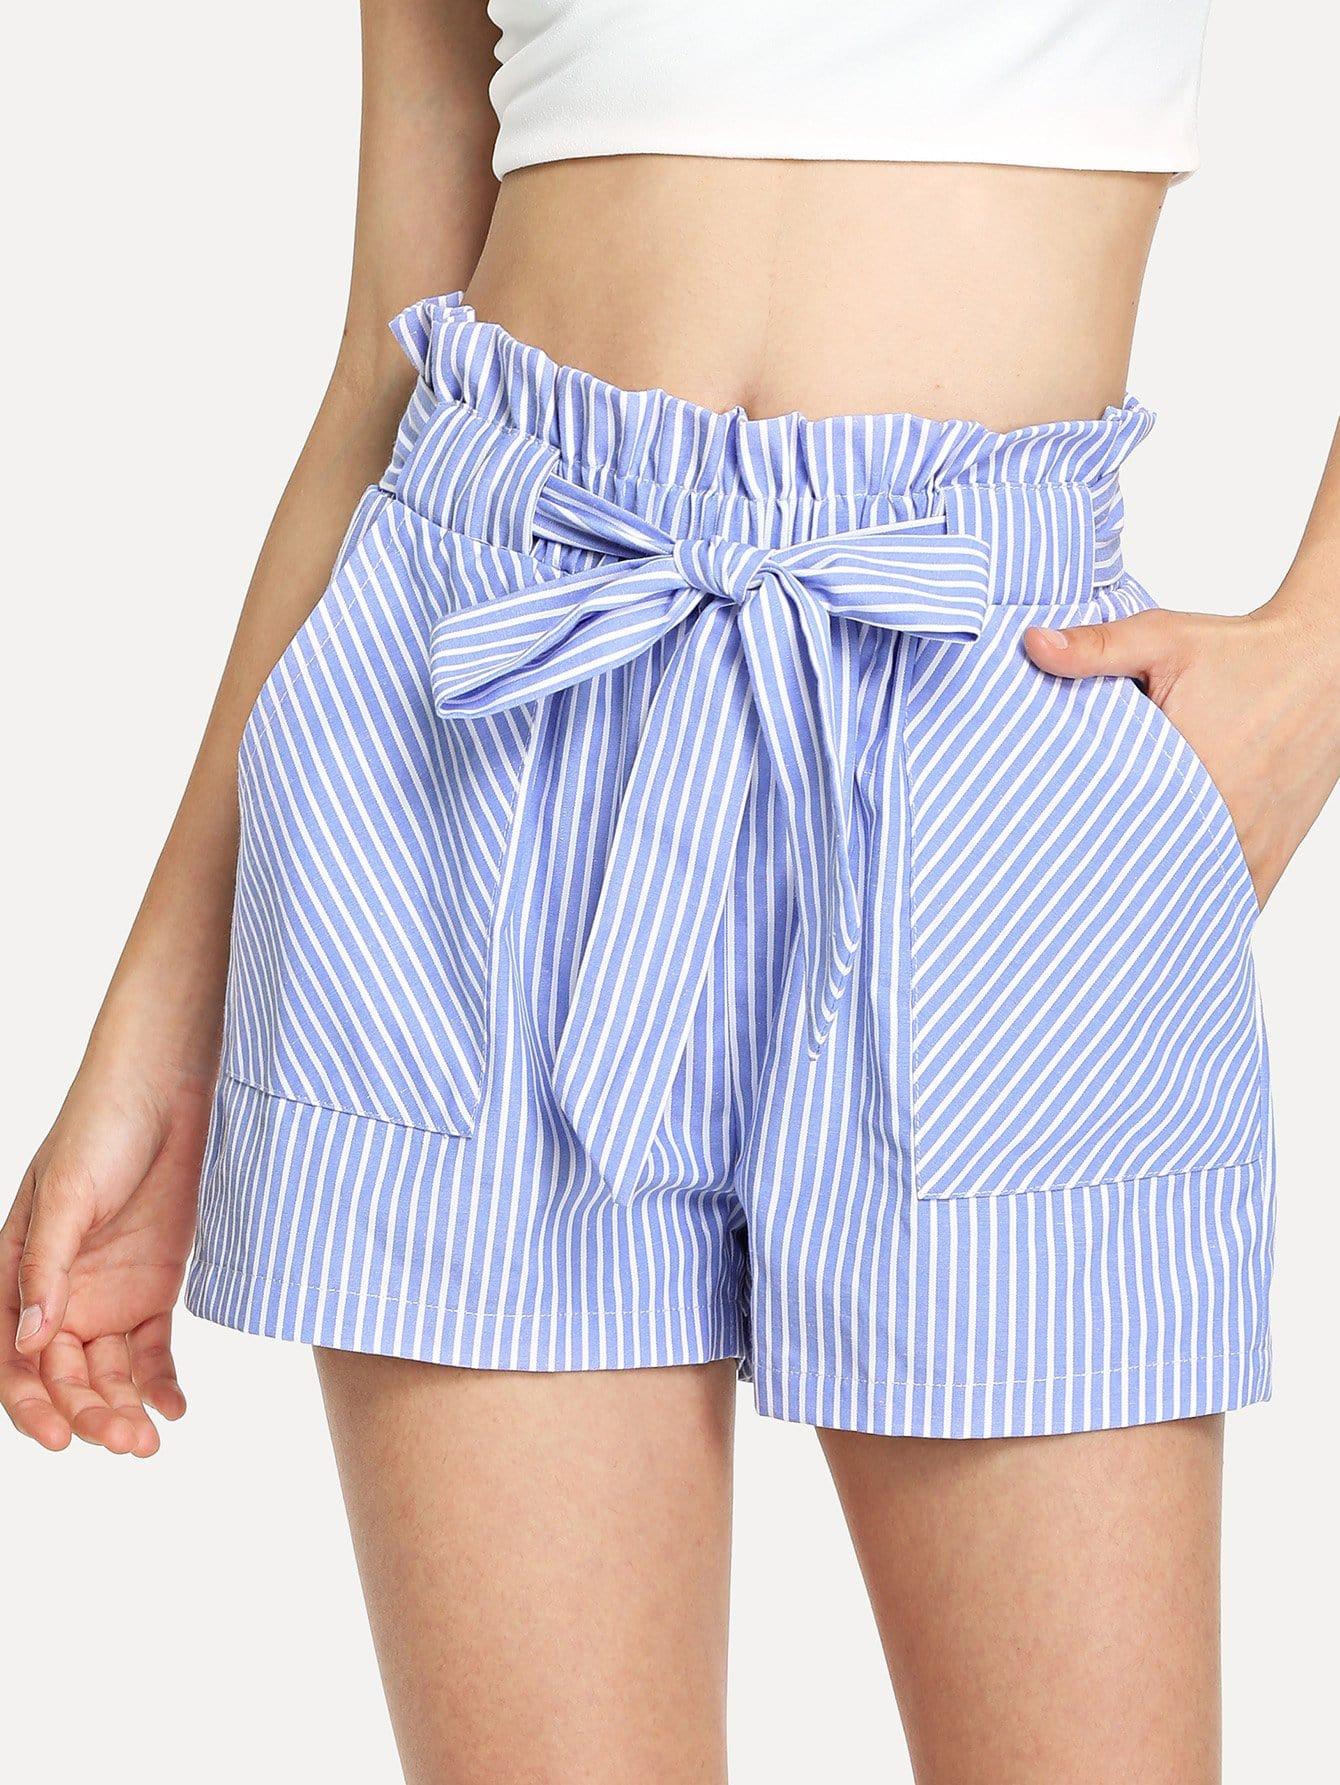 Pocket Patched Frill Belted Waist Pinstripe Shorts high waist pocket patched dot skirt